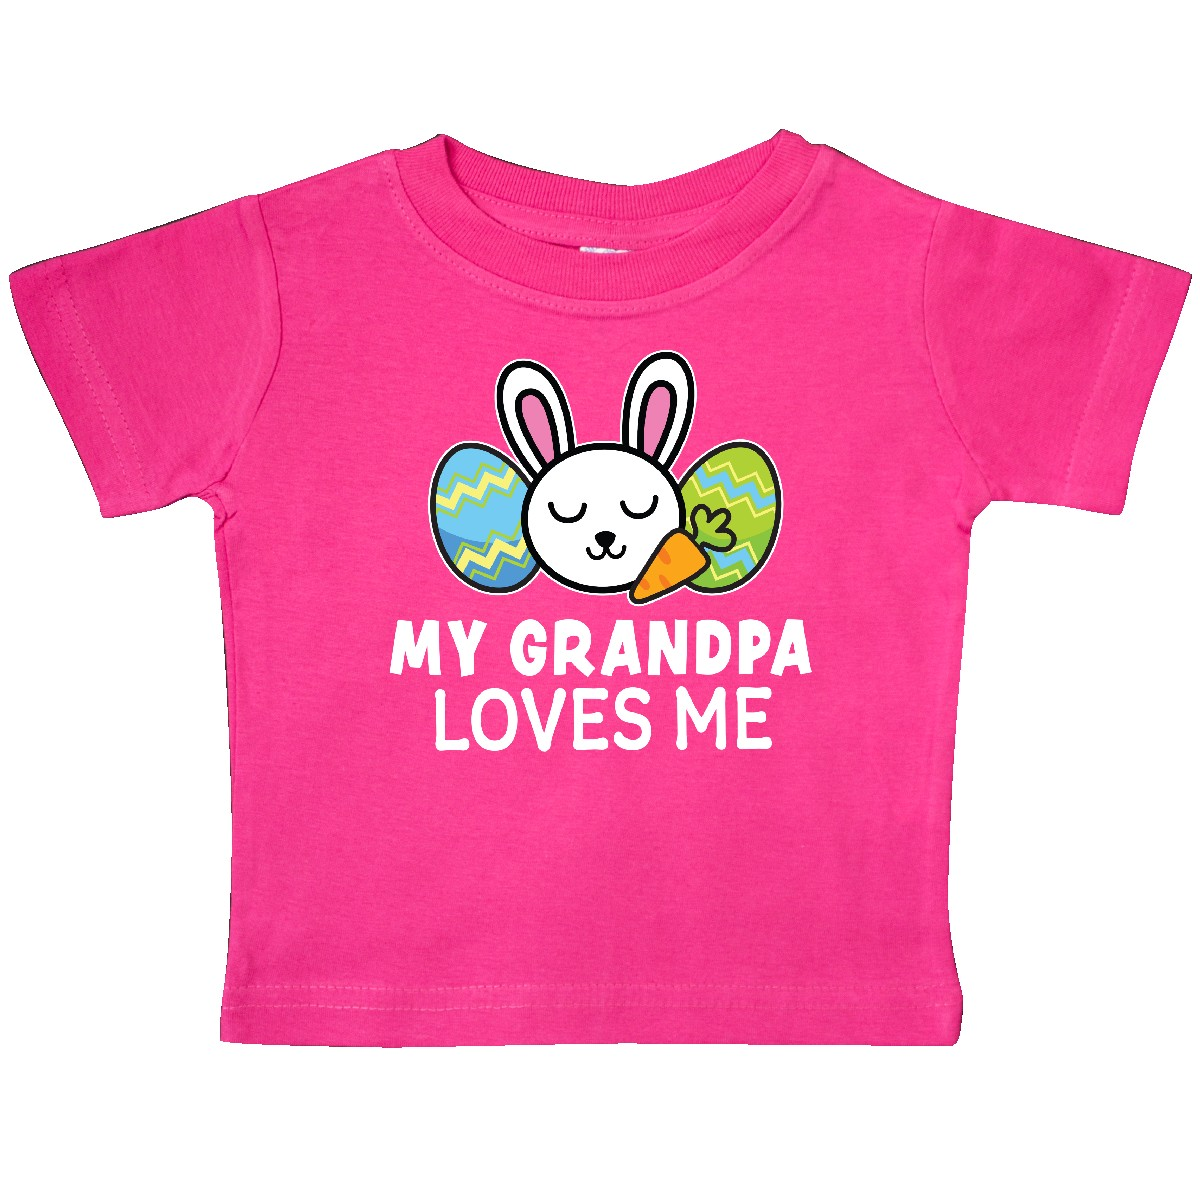 Inktastic My Papa Loves Me Grandchild Toddler T-Shirt Gift From Grandpa Elephant